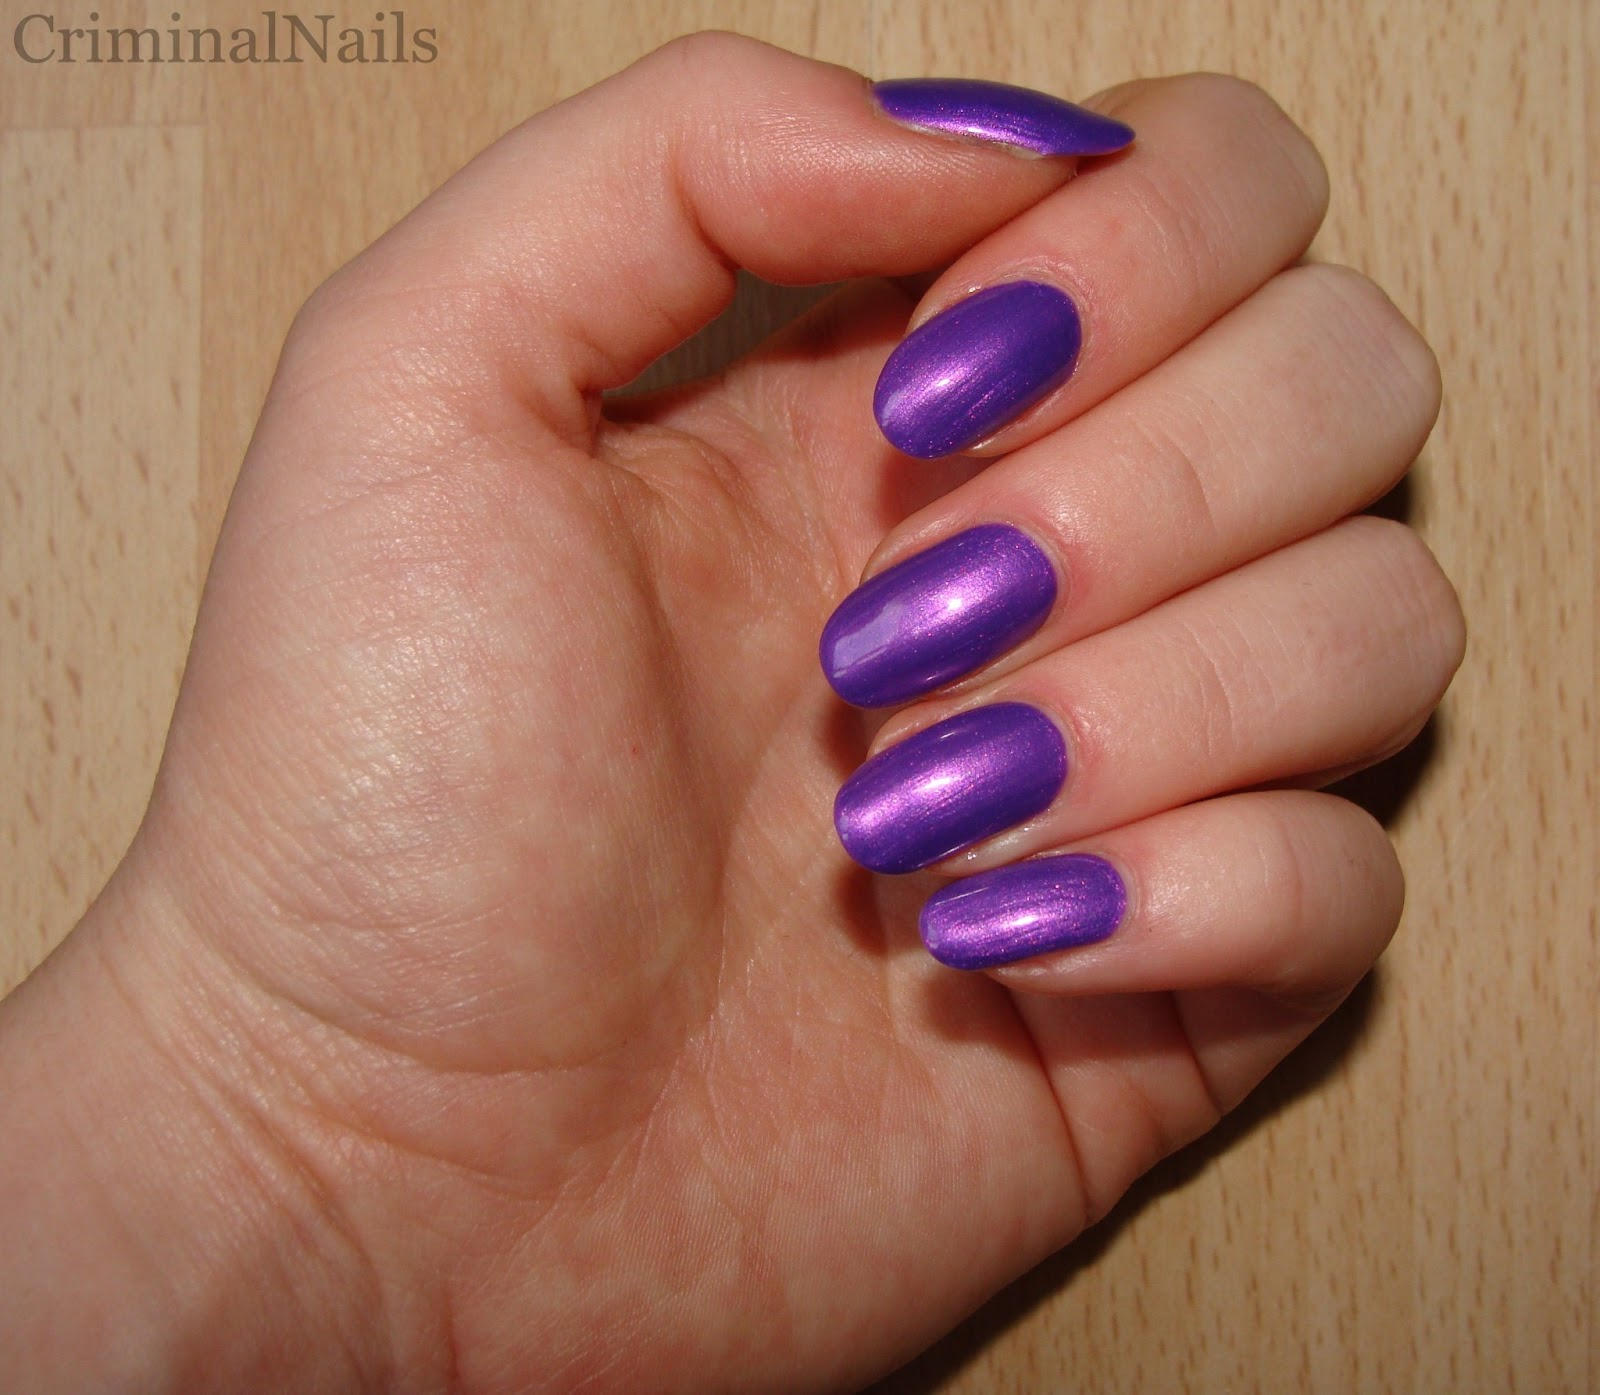 Criminal Nails: ABC Challenge: Letter E - Express Nails nº 201